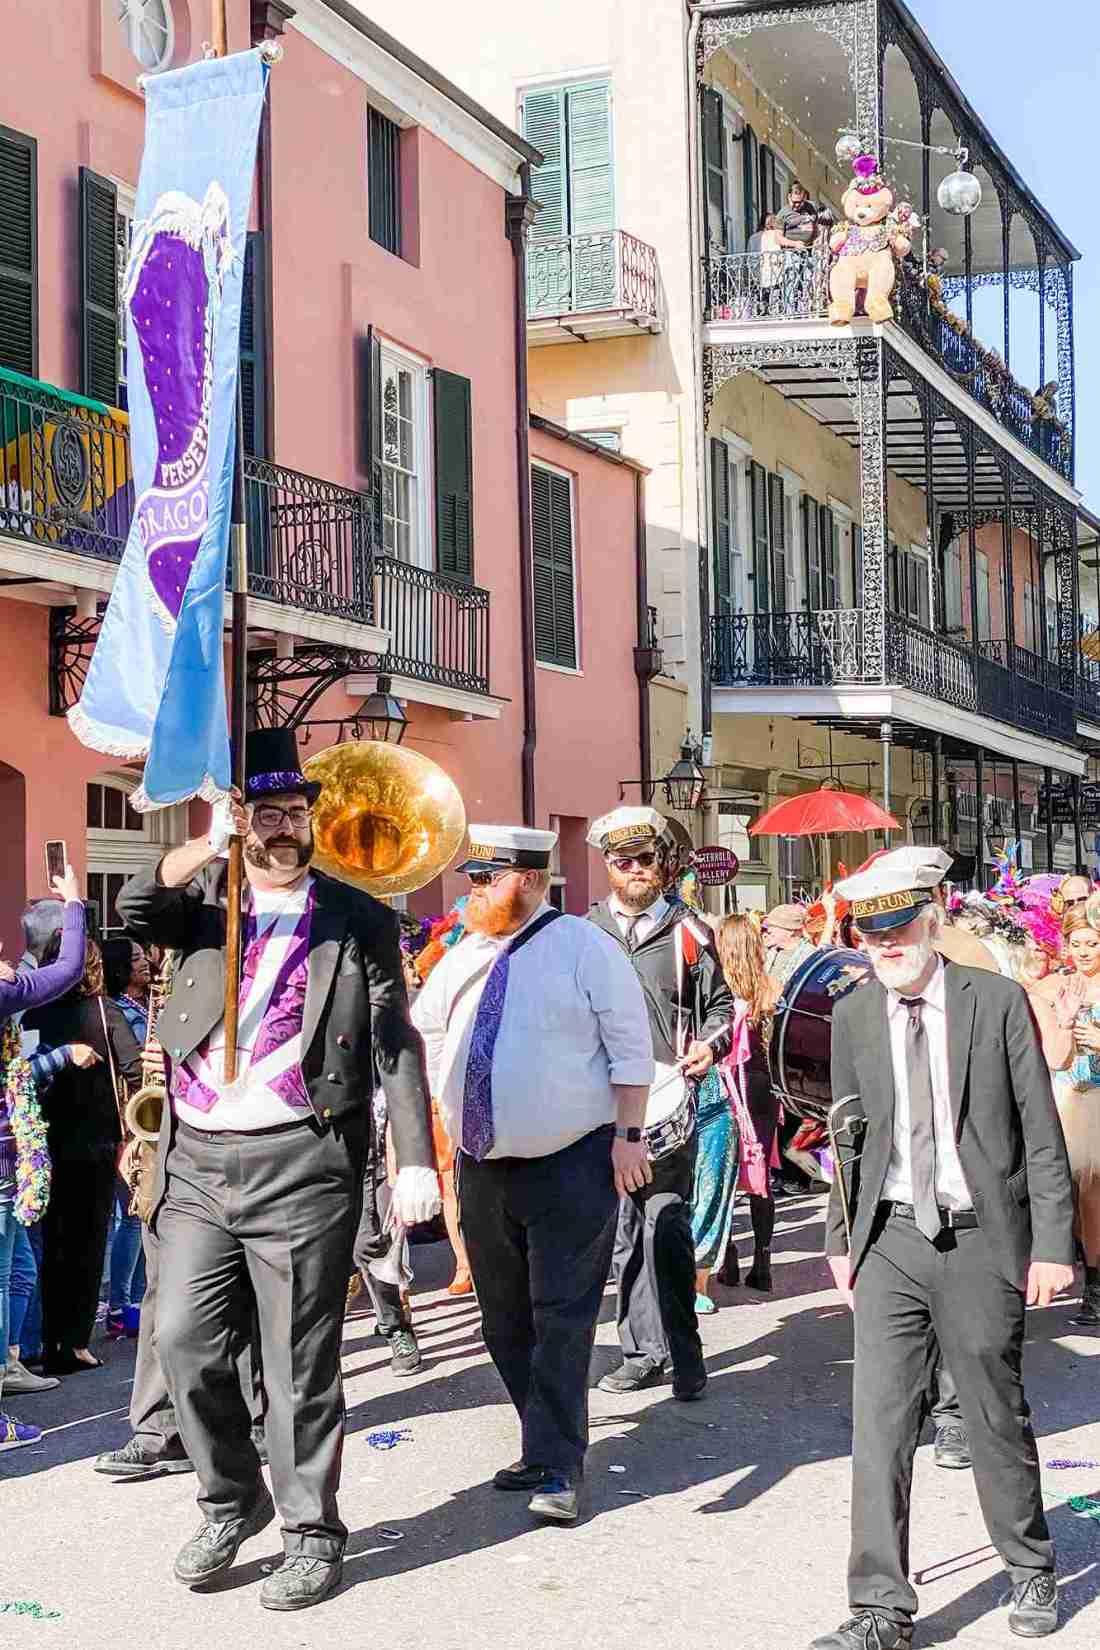 Older men walk down street playing instruments